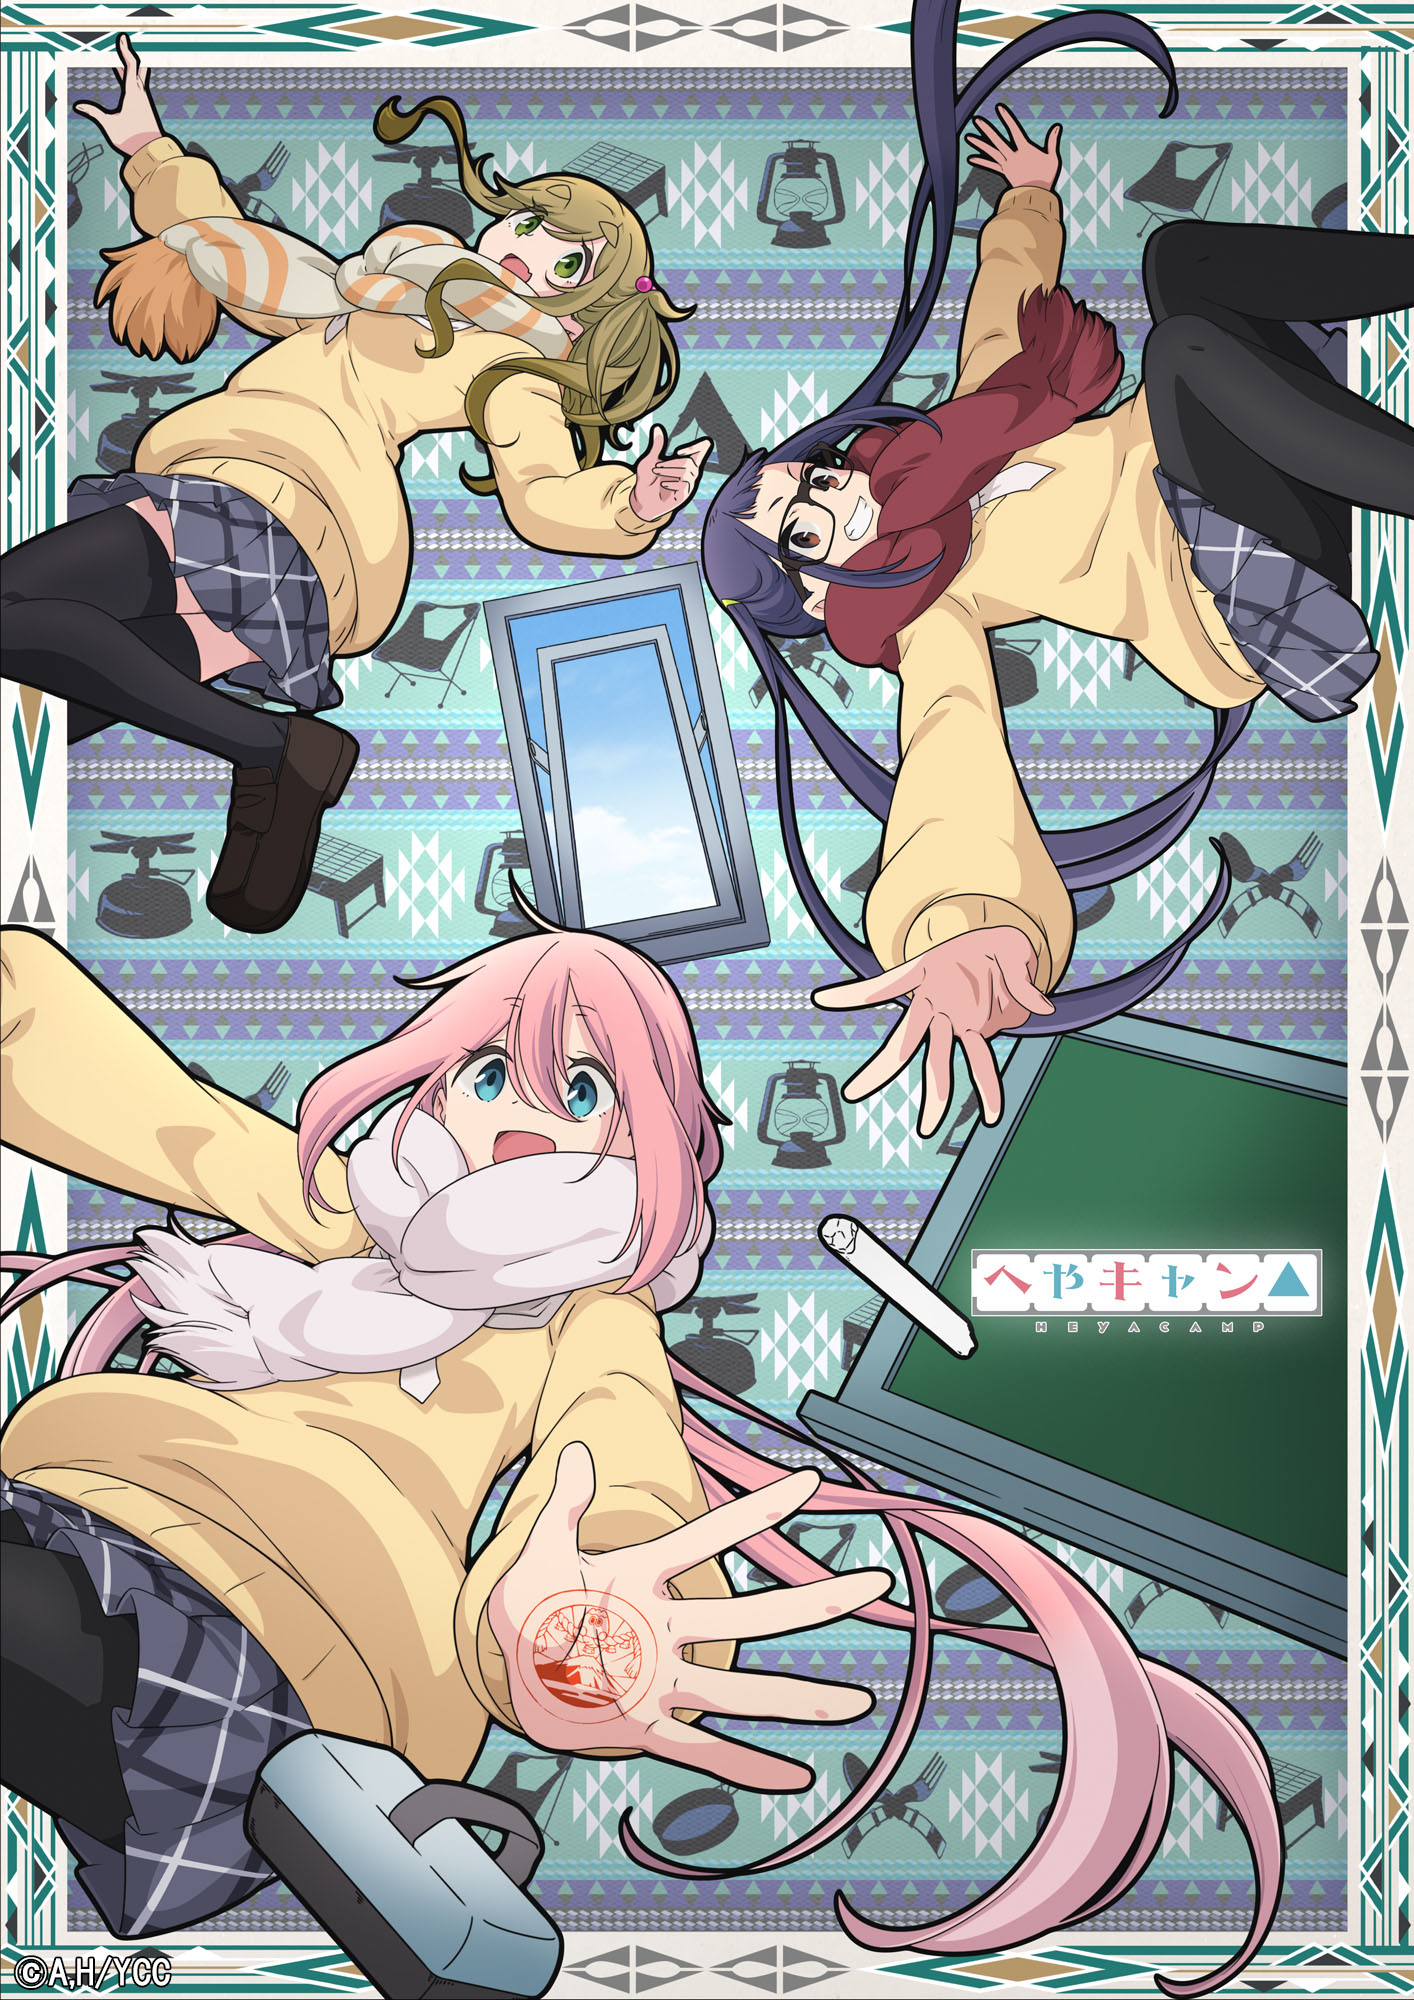 yurucamp_anime 1195265180889997312_p0